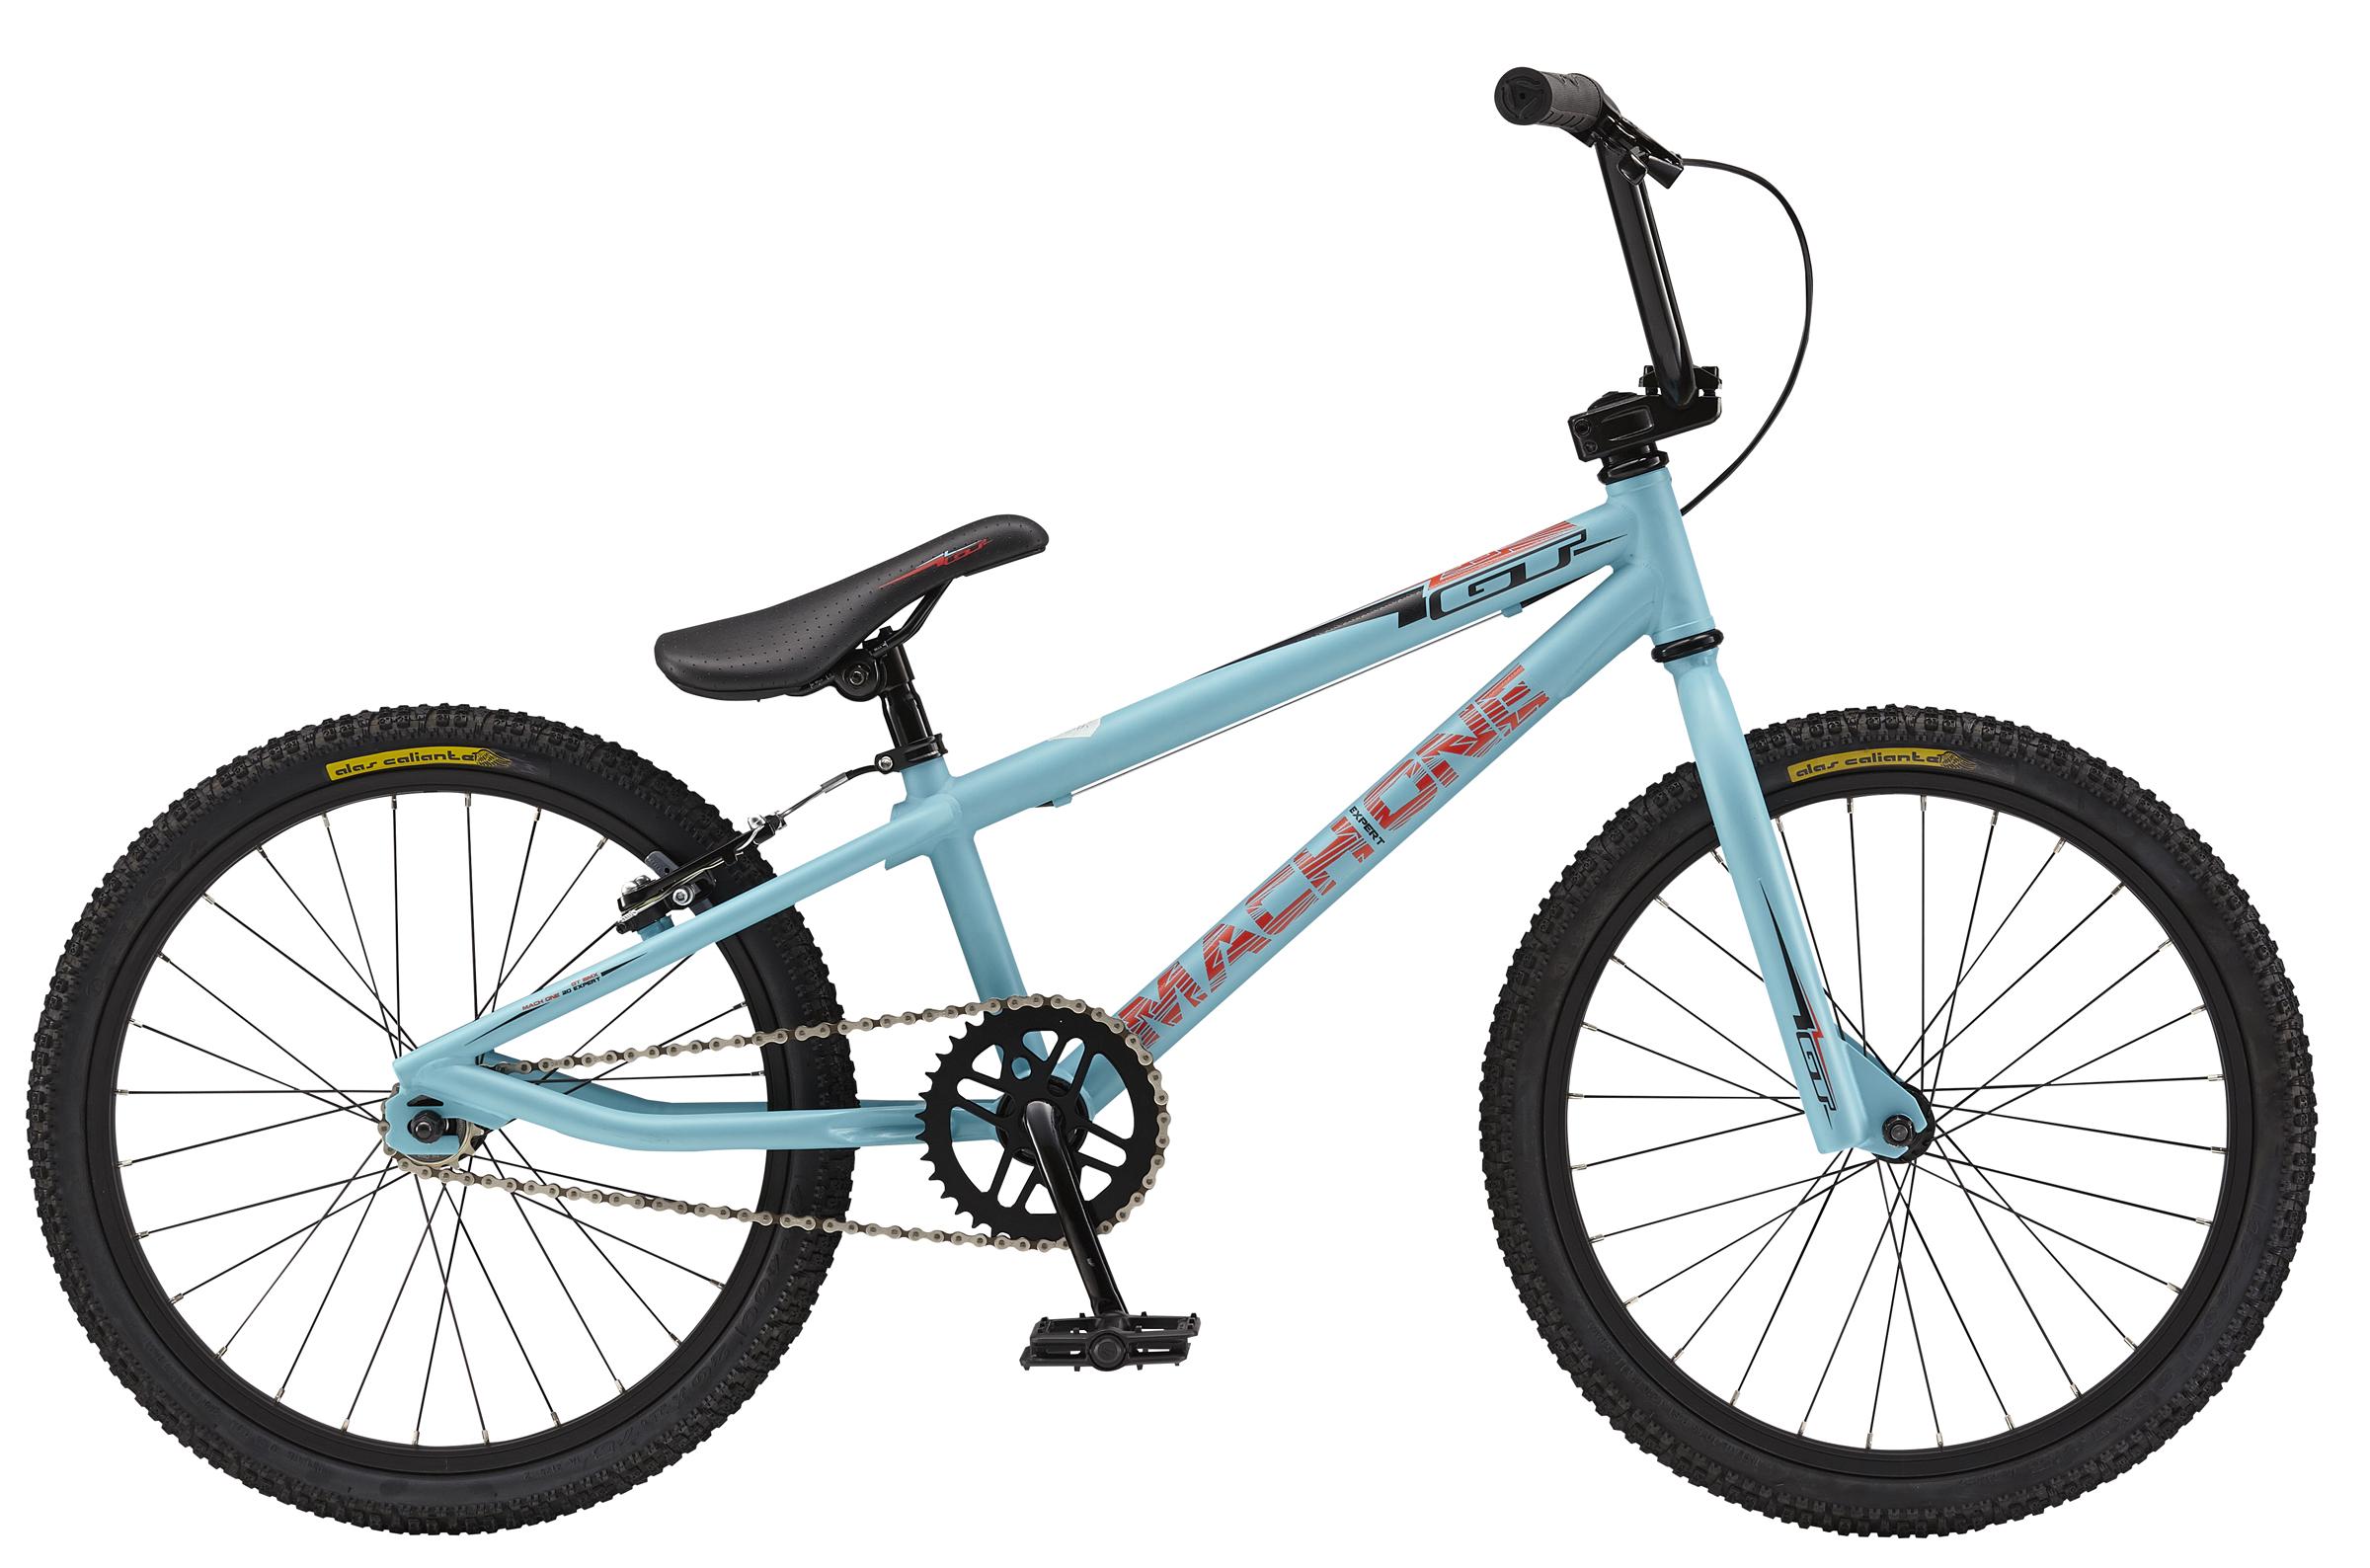 Gt Mach One Expert Sunset Cyclery St Louis Missouri